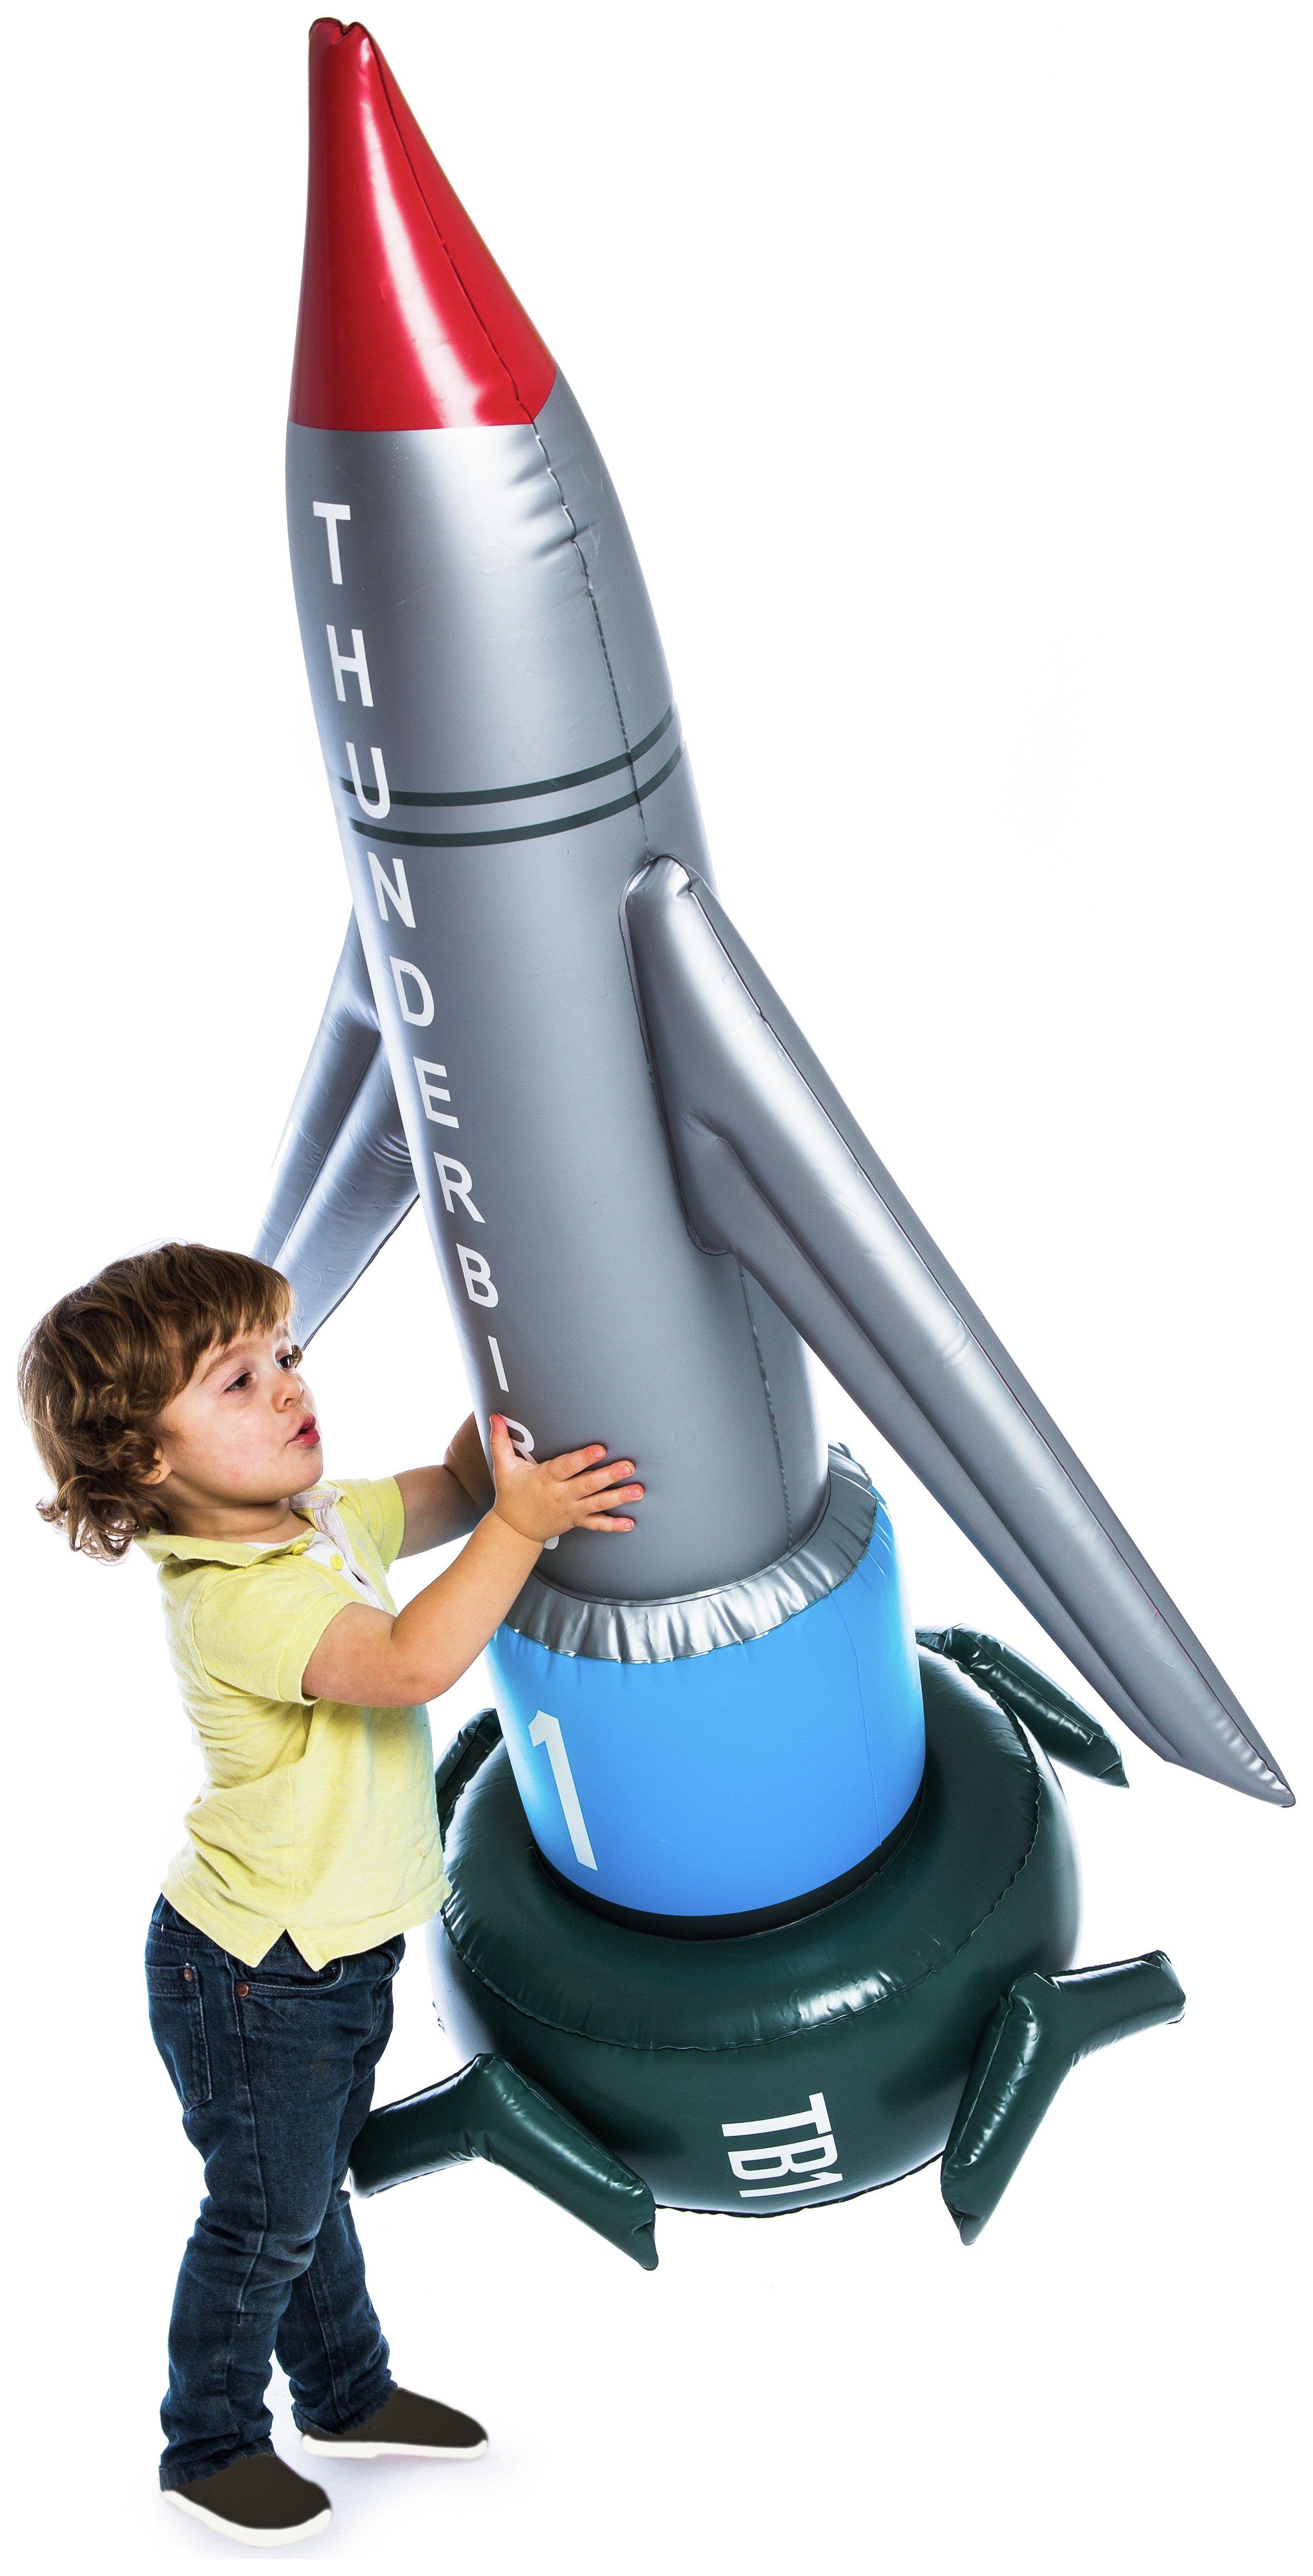 Thunderbird 1 Inflatable Rocket.